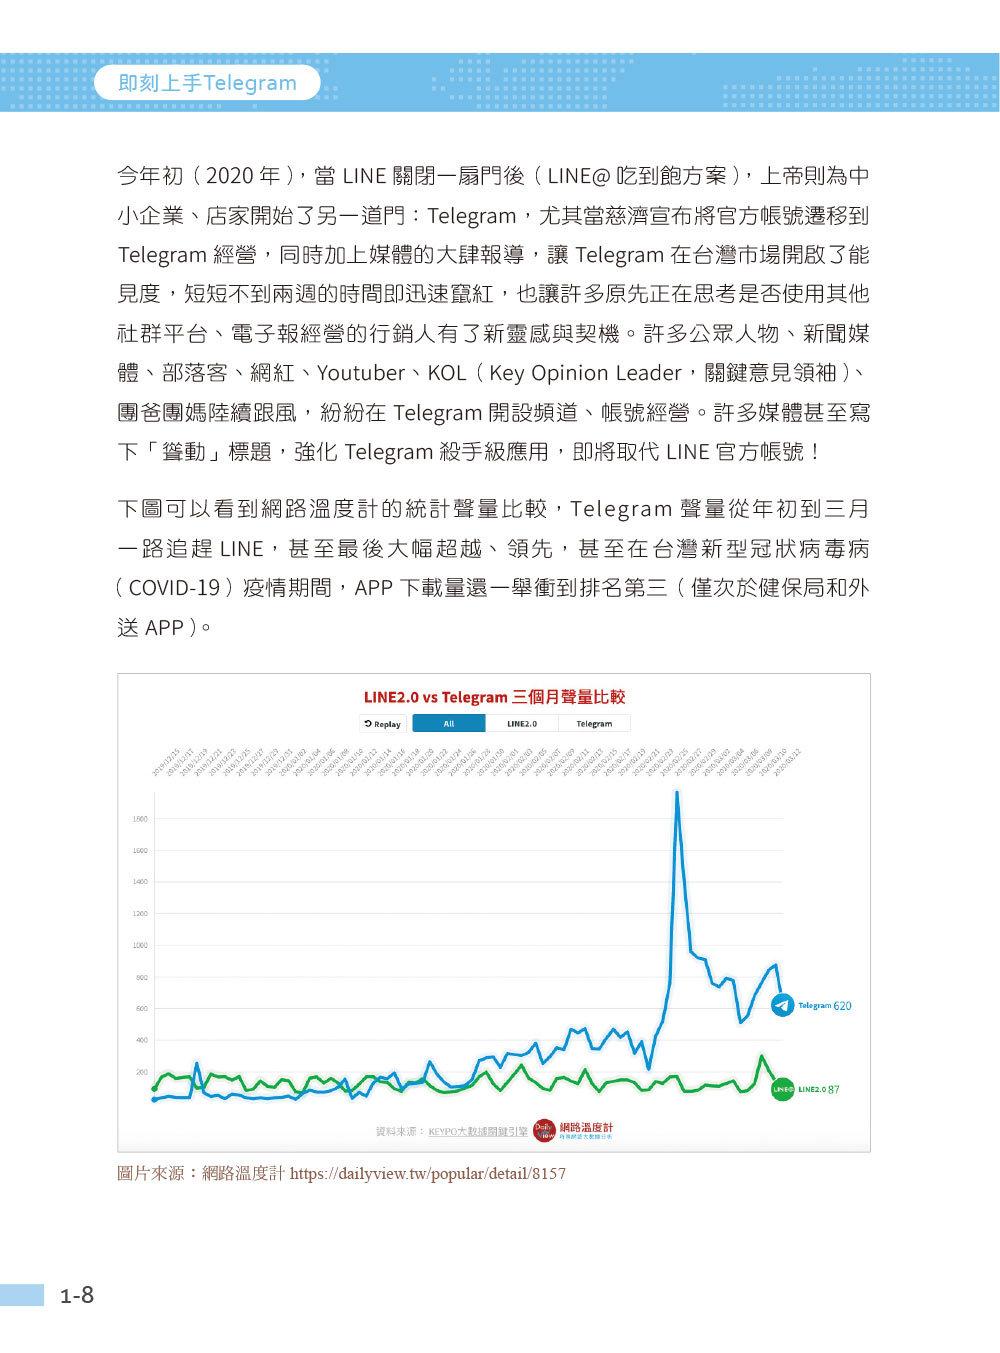 Telegram 行動行銷|操作技巧x品牌貼圖x經營心法-preview-4